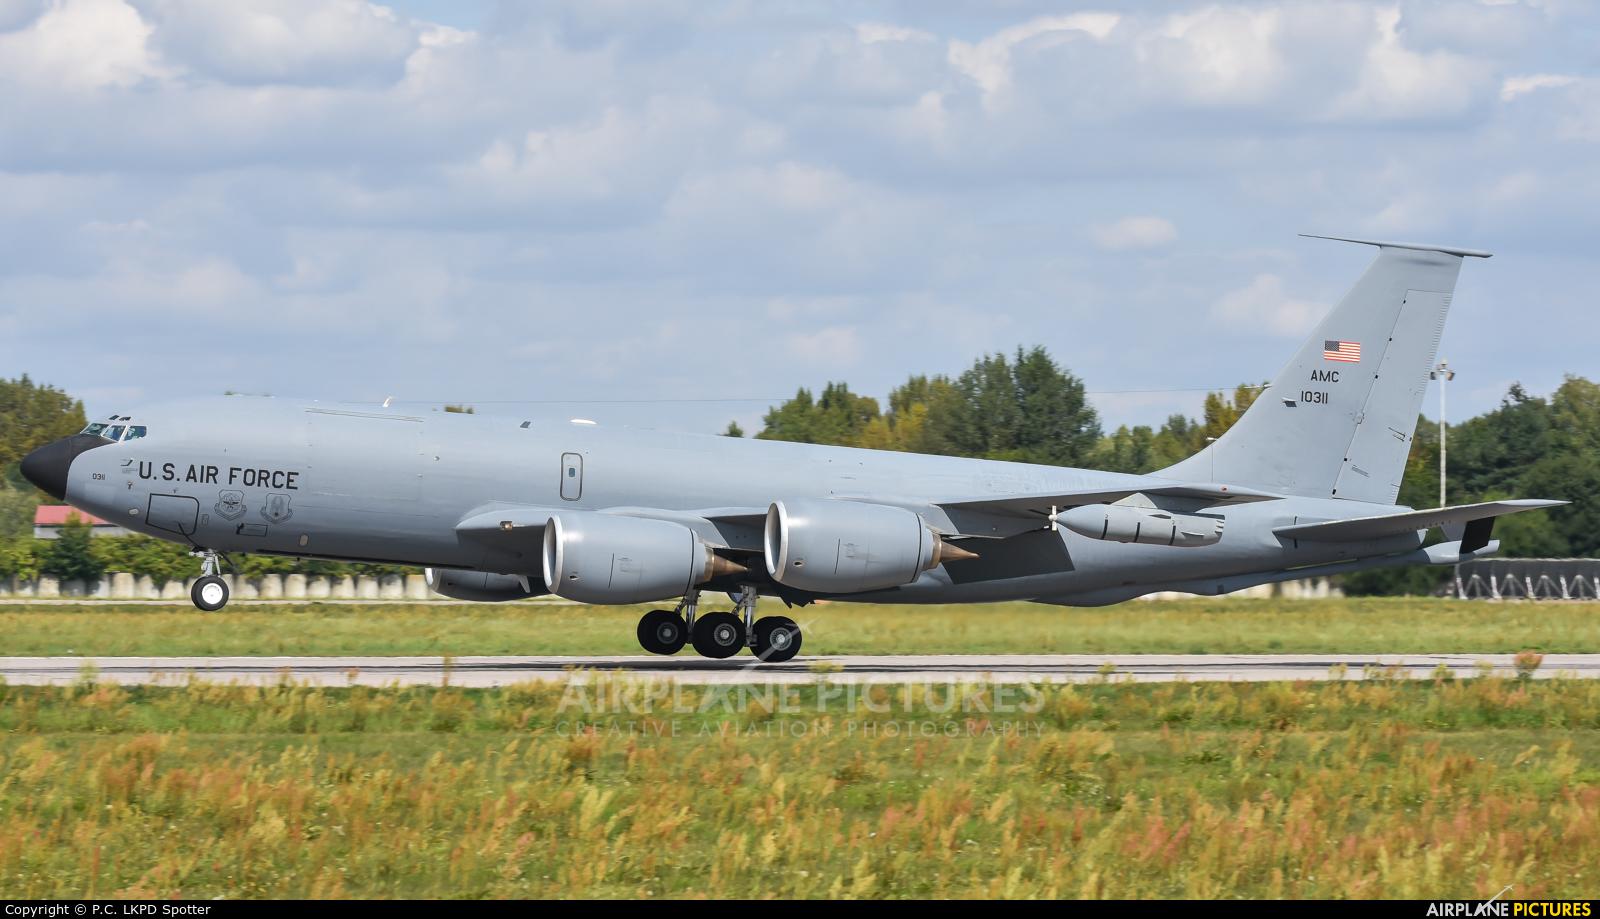 USA - Air Force 61-0311 aircraft at Pardubice